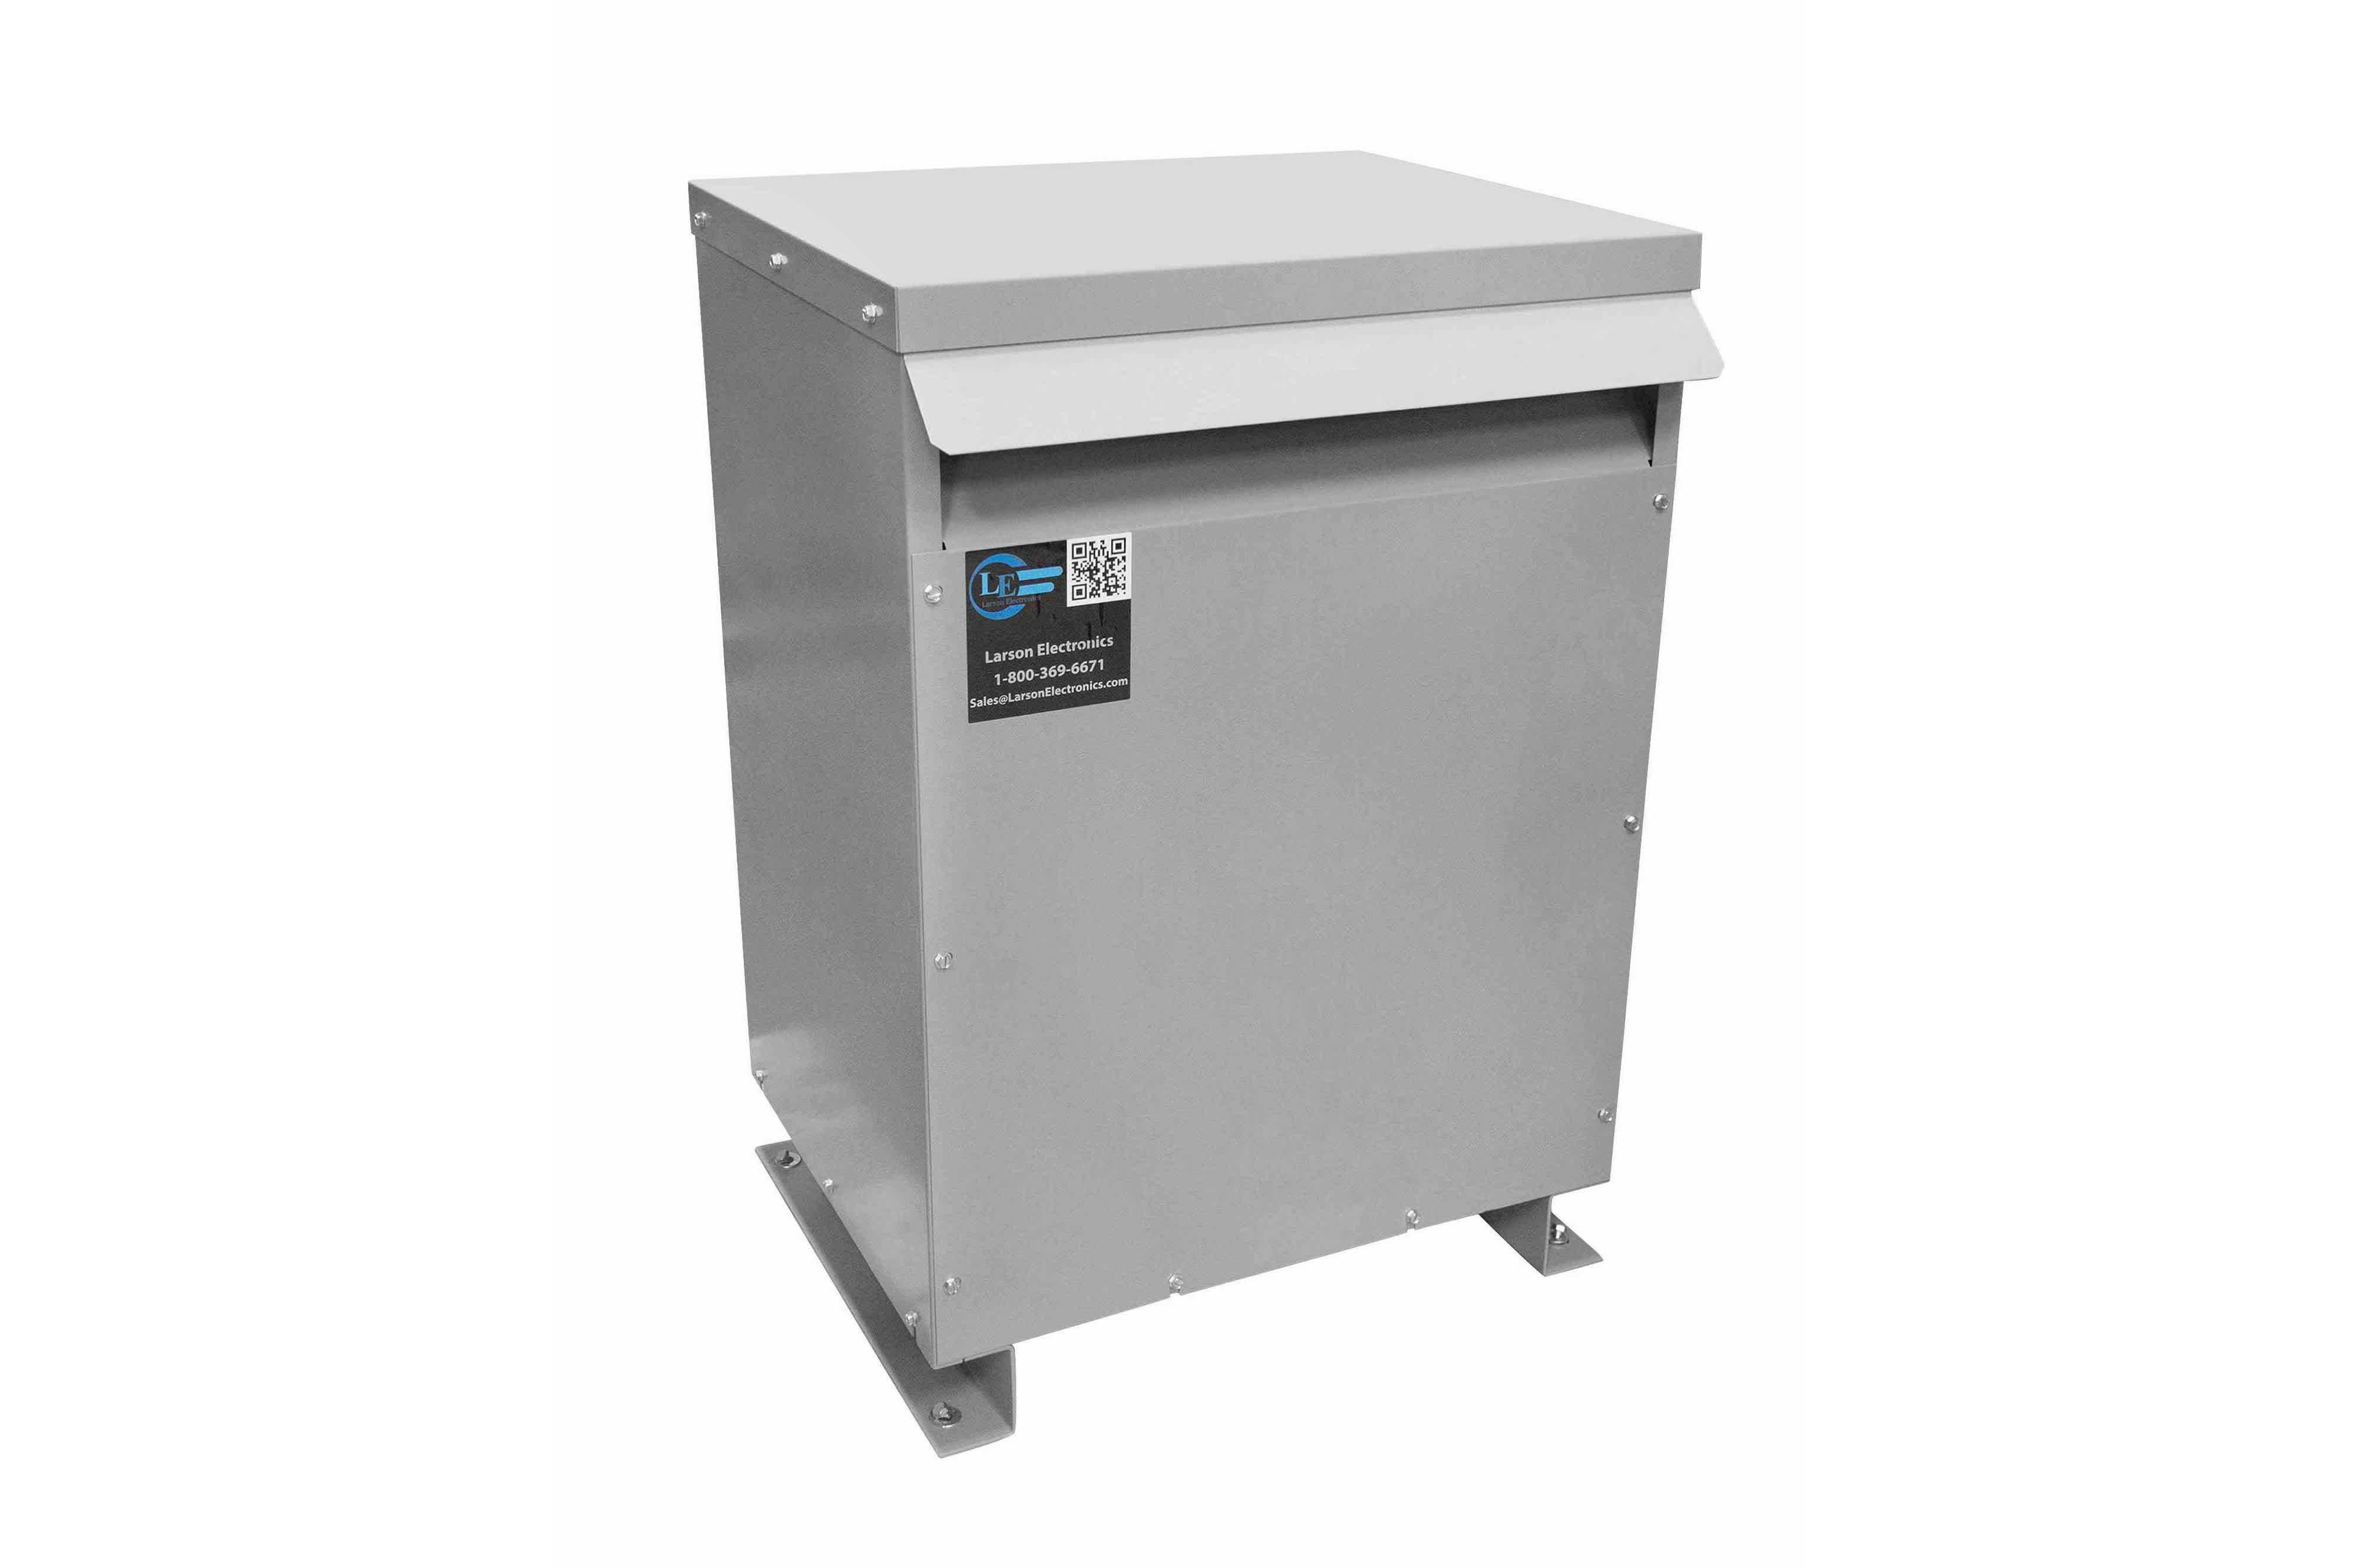 800 kVA 3PH Isolation Transformer, 460V Wye Primary, 240V Delta Secondary, N3R, Ventilated, 60 Hz